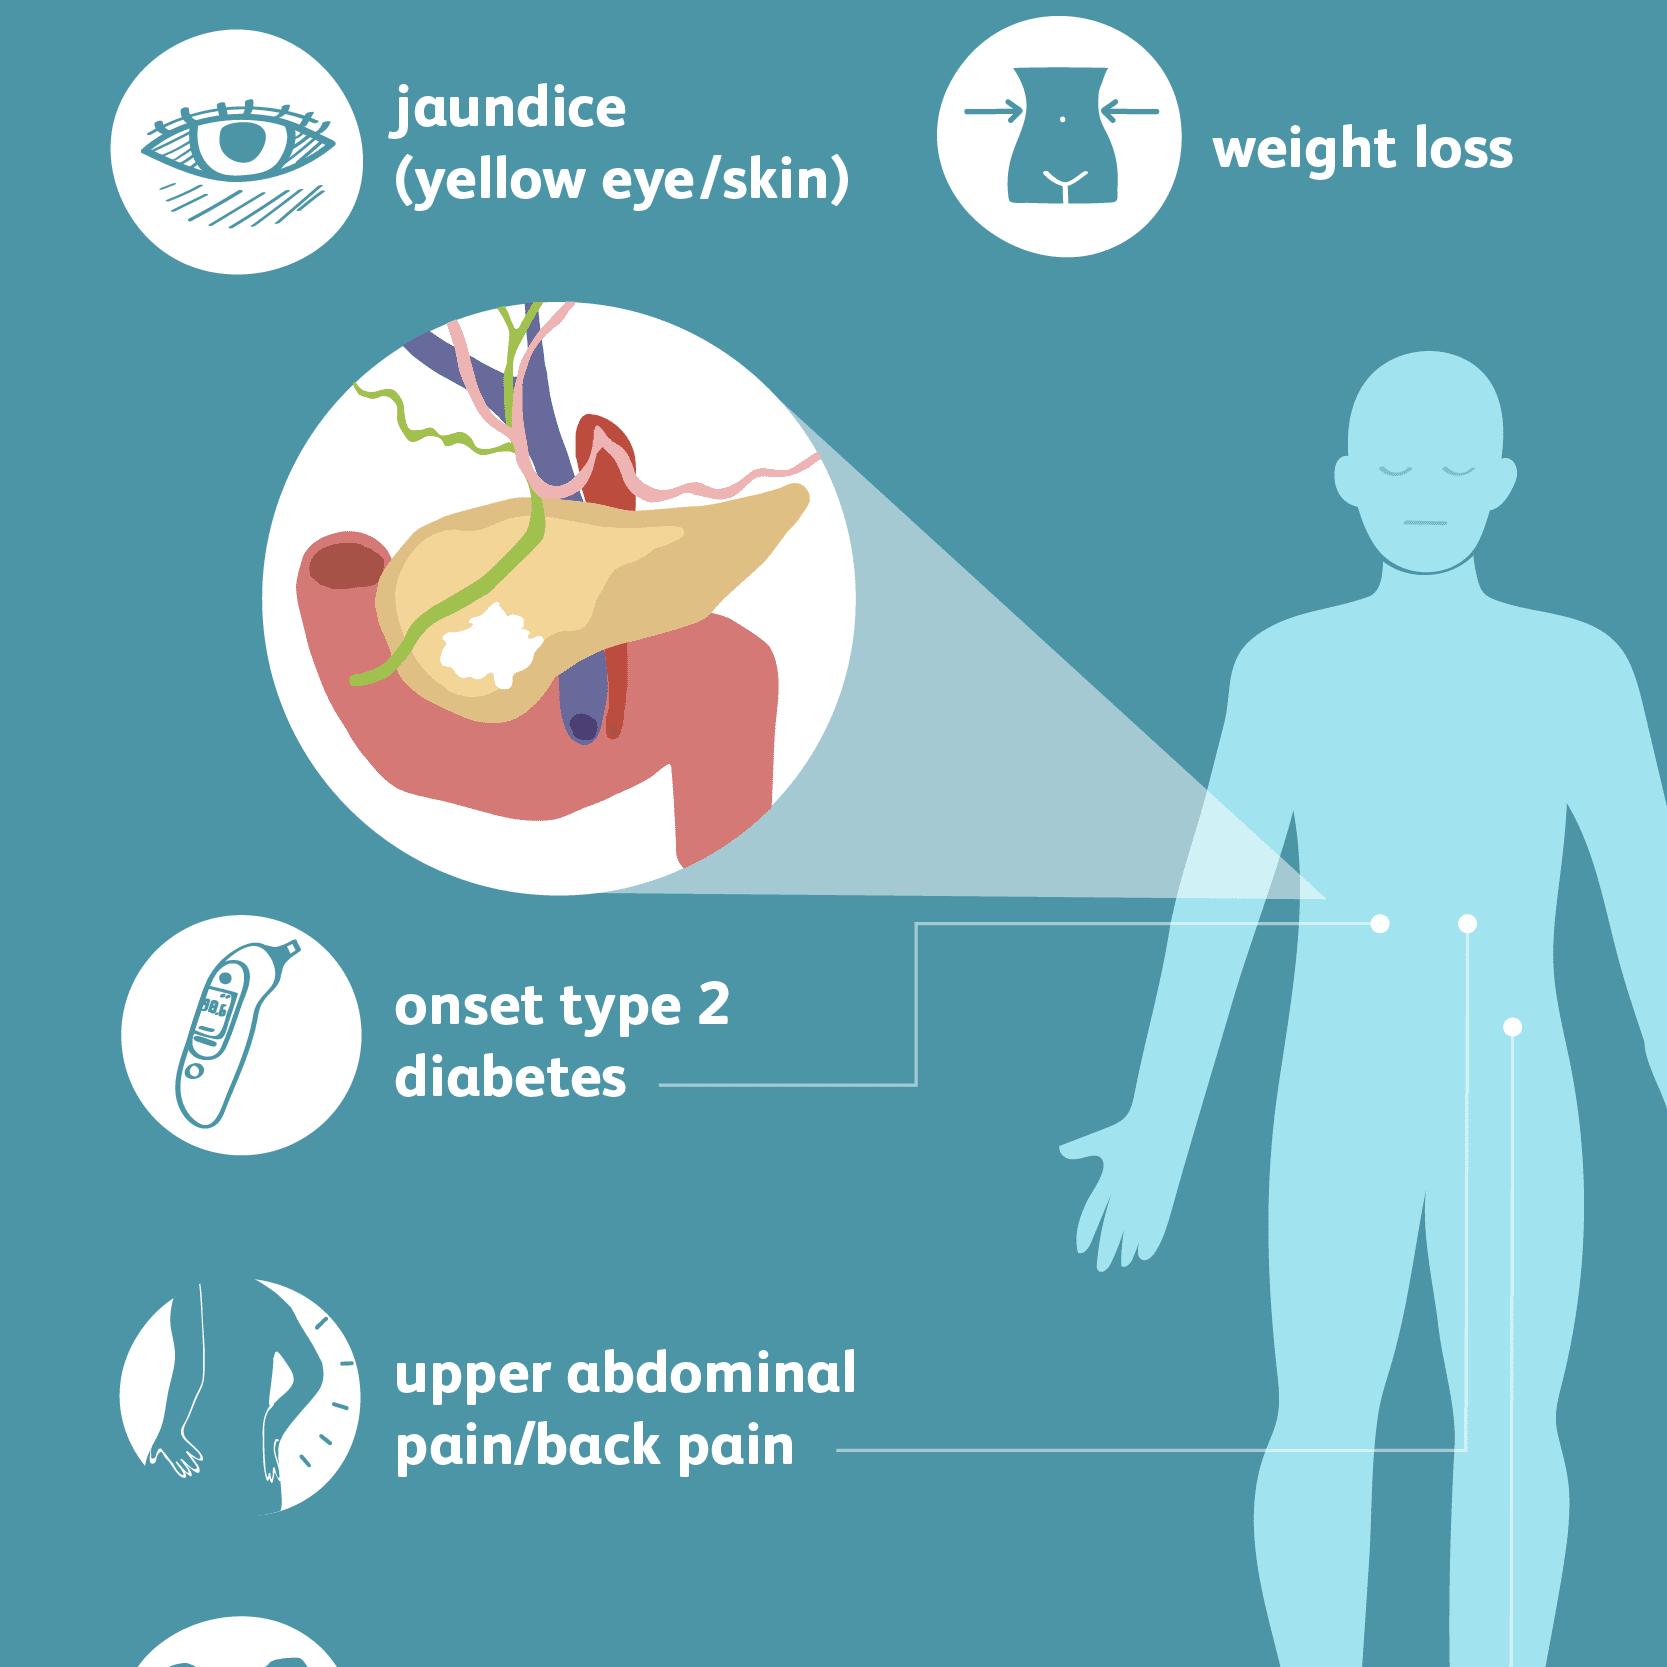 pancreatic cancer diagnosis extracția nematodului